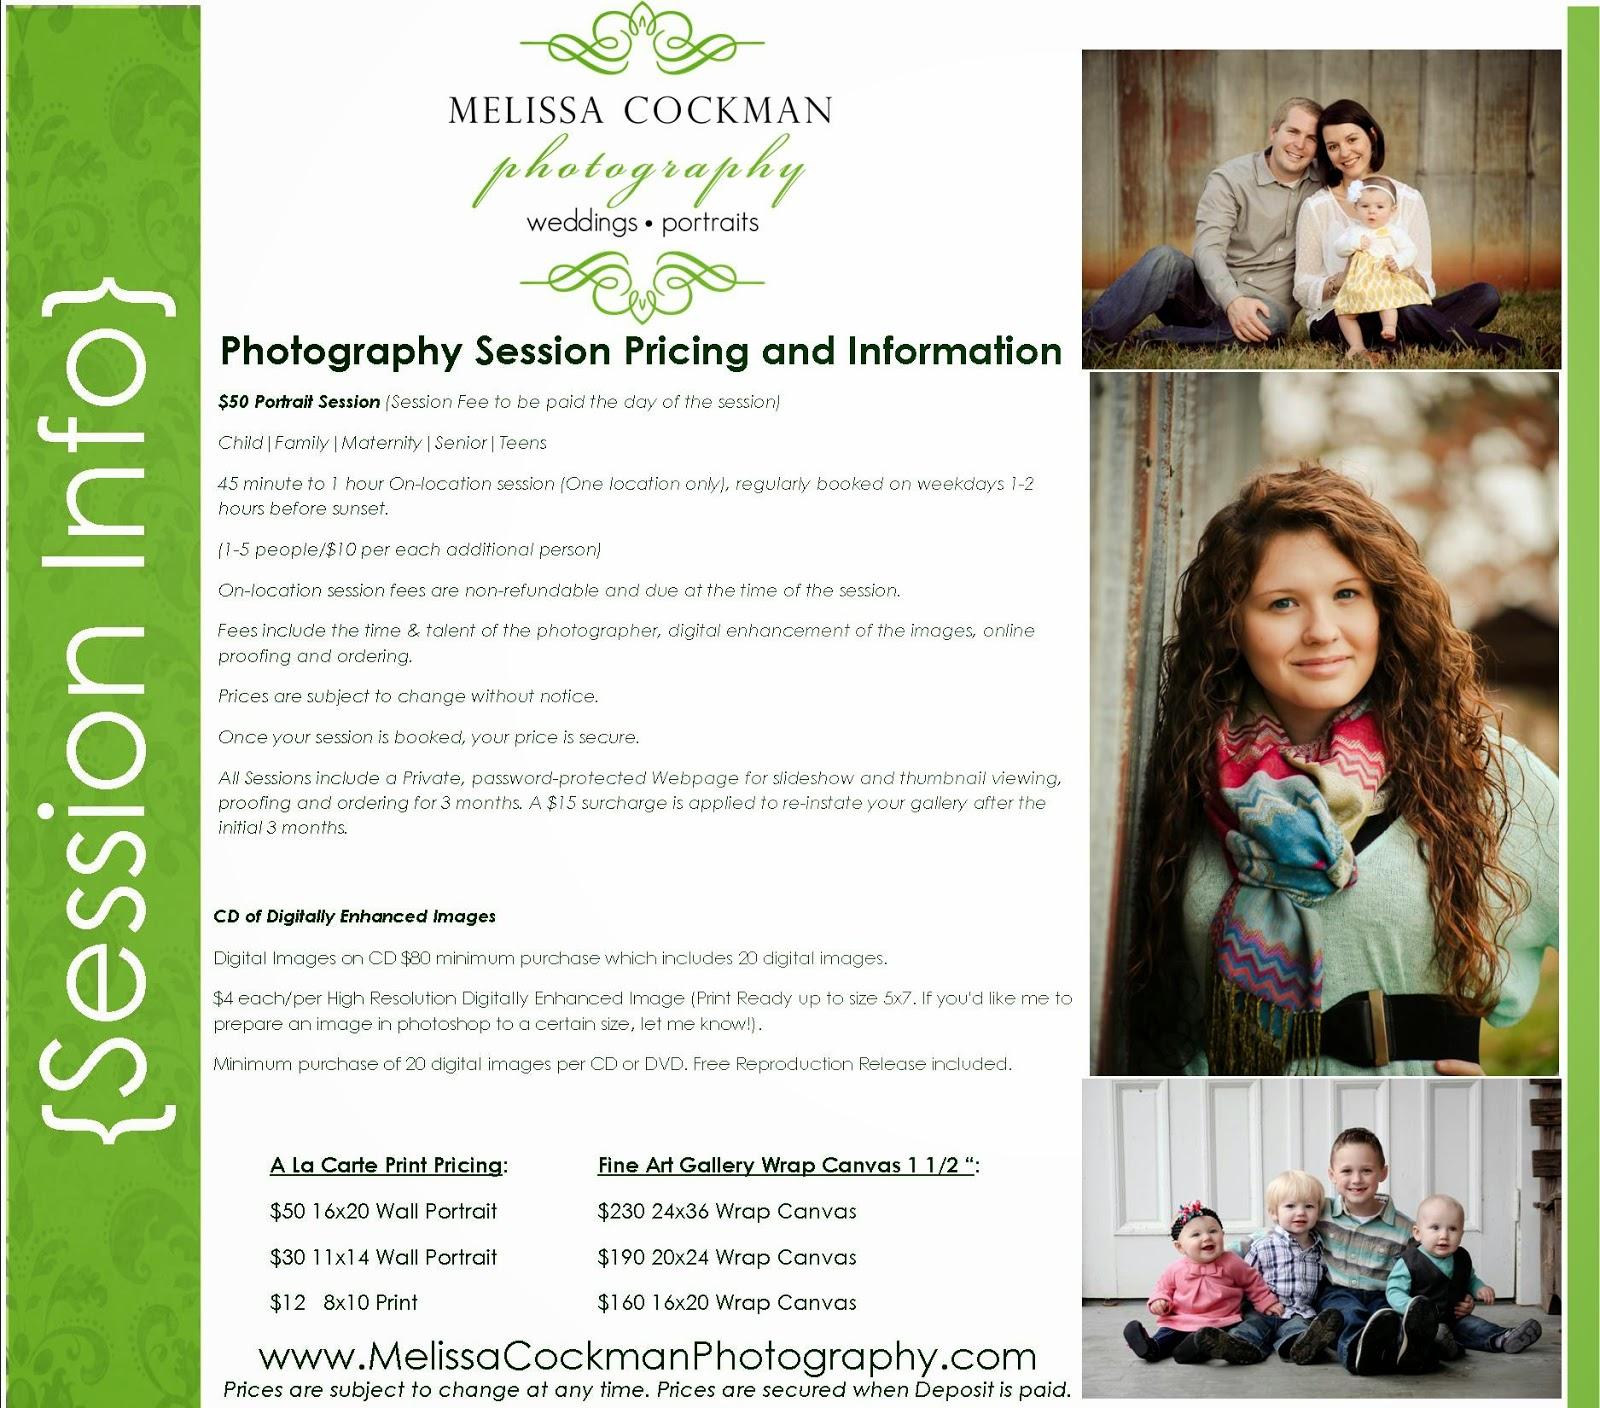 Melissa Cockman Photography {the blog}: Portrait Pricing: Child